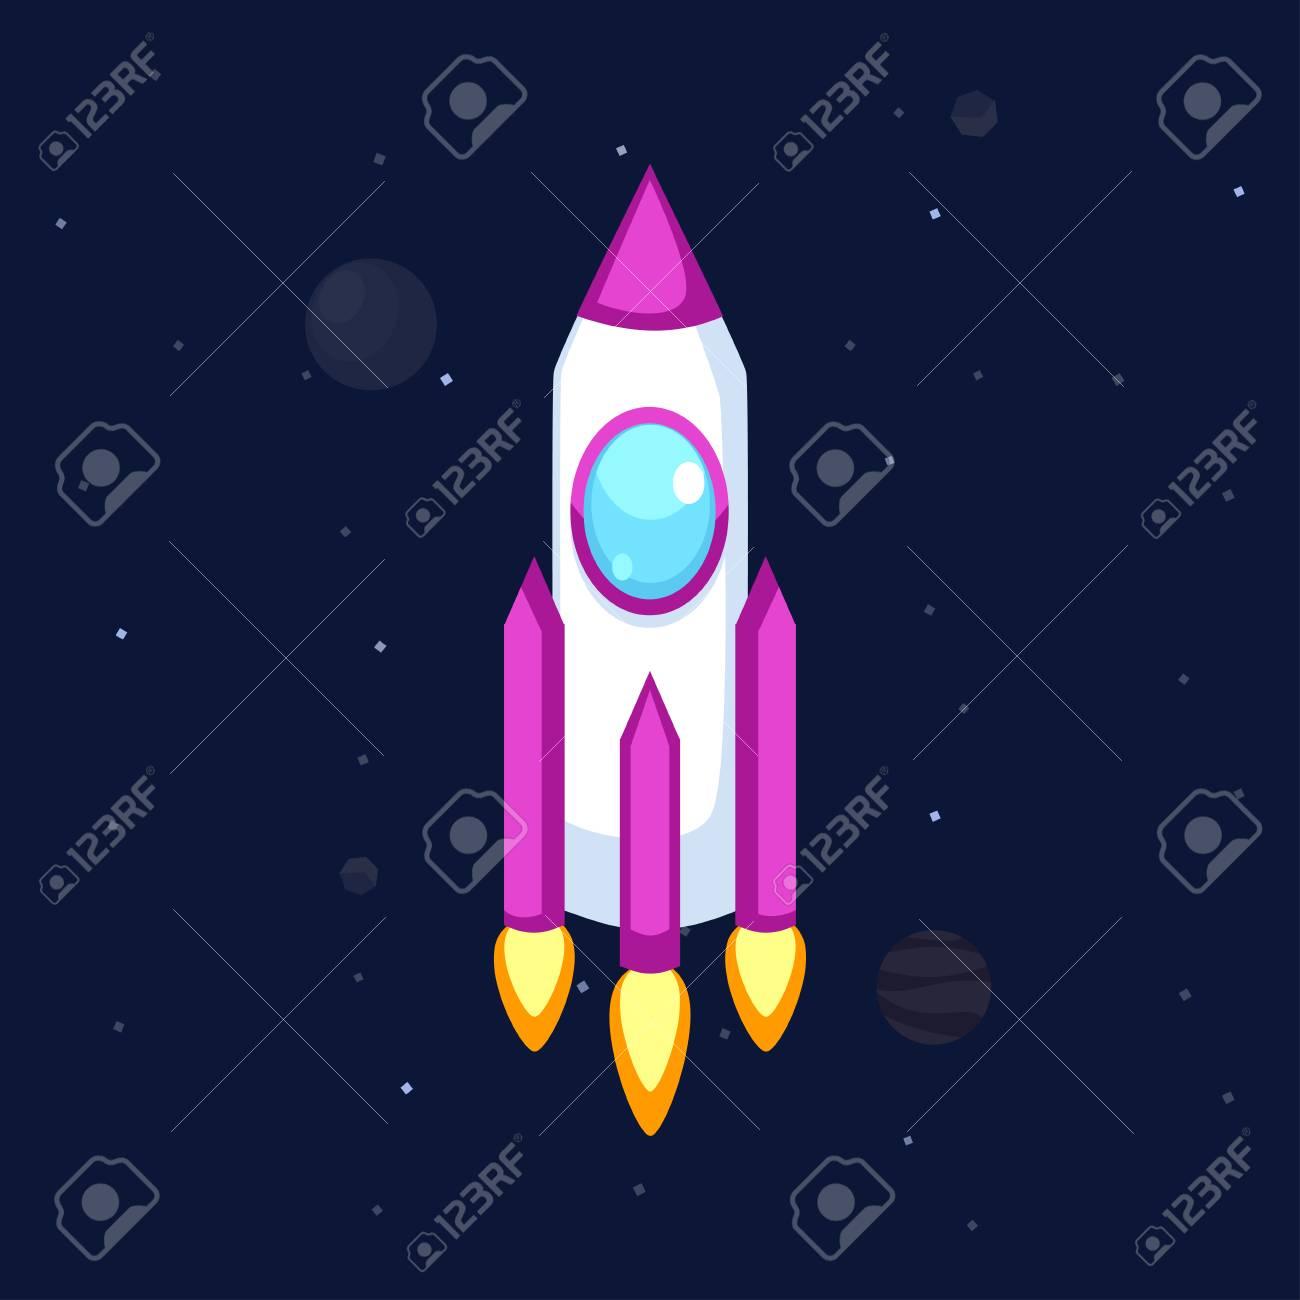 Rocket icons - 69017555